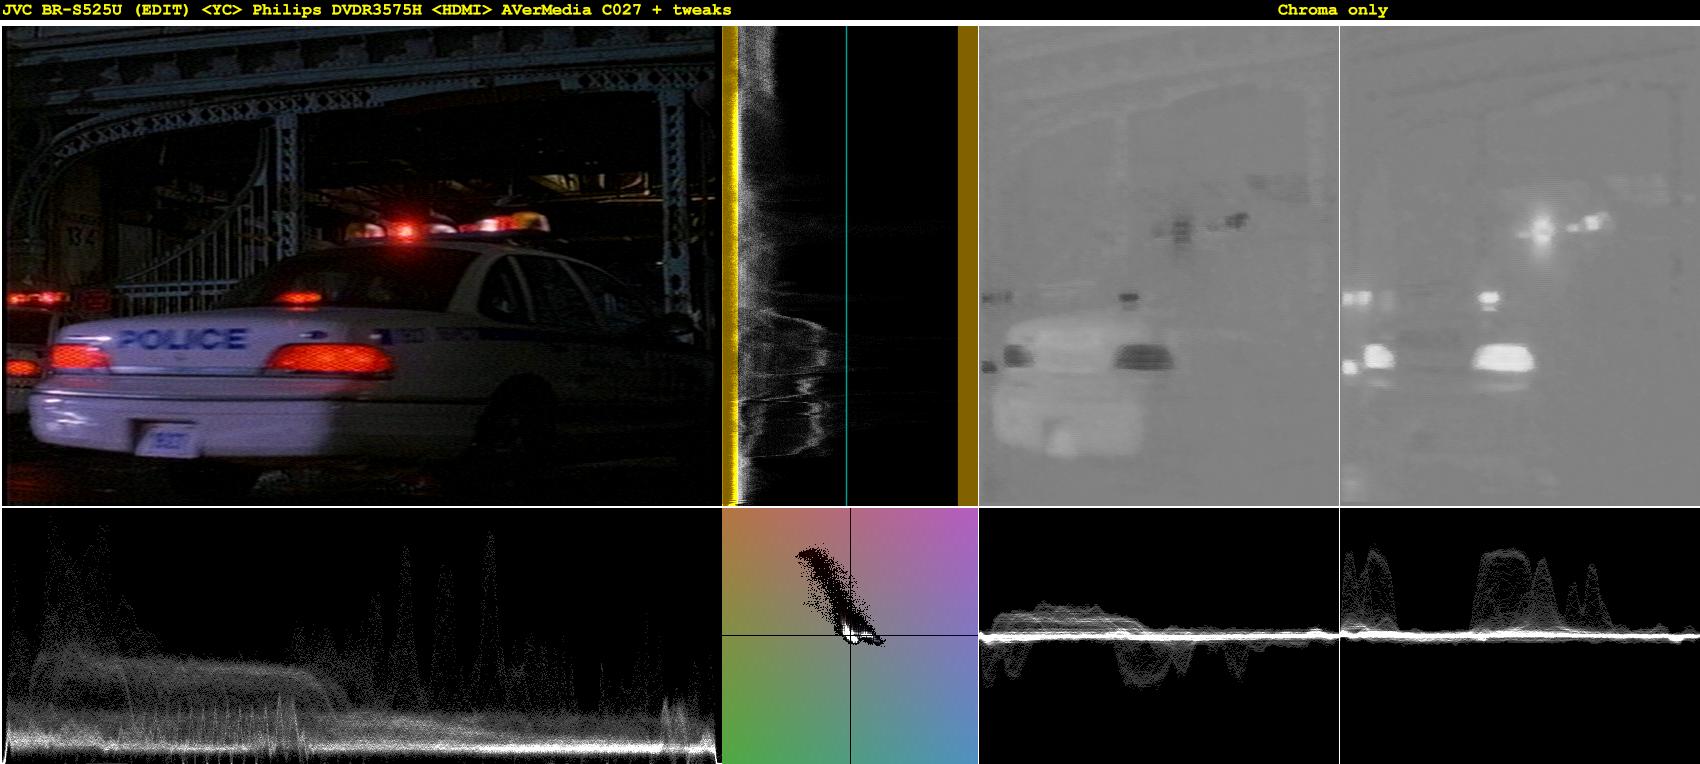 Click image for larger version  Name:0-55-31 - JVC BR-S525U (EDIT).png Views:1111 Size:862.7 KB ID:37676